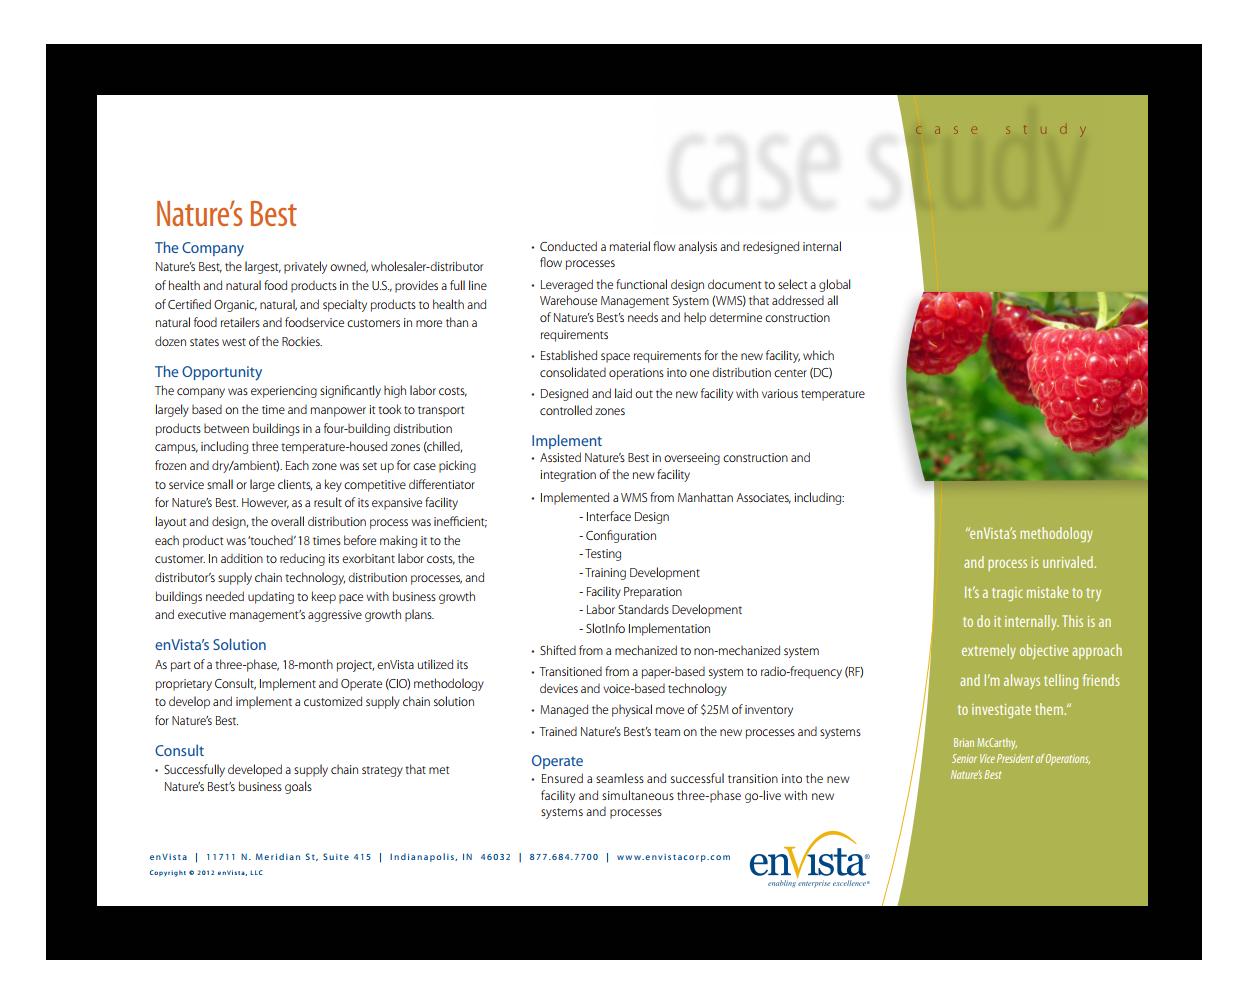 Case Study: Nature's Best